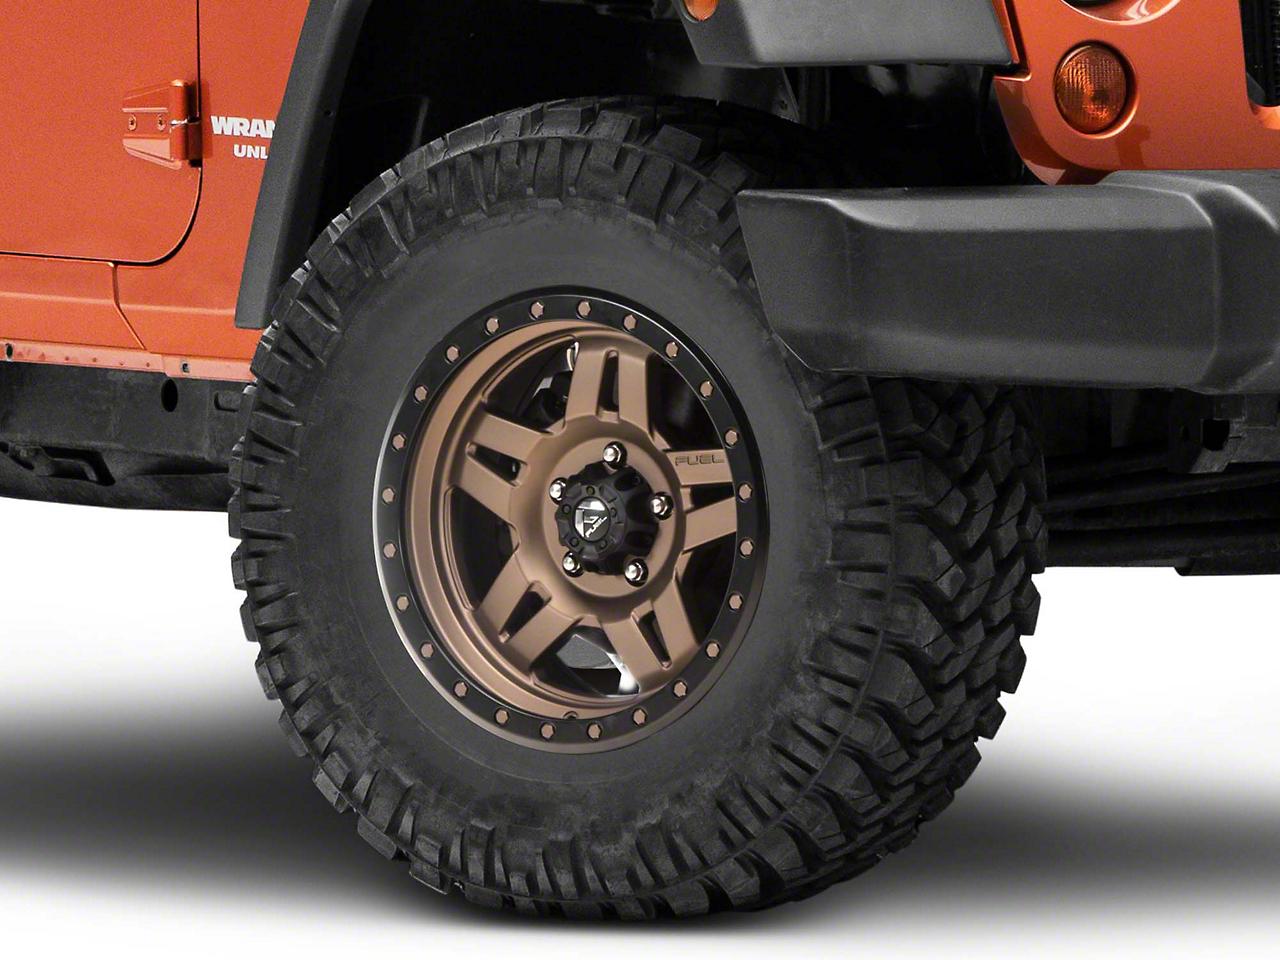 Fuel Wheels ANZA Bronze Wheel - 17x8.5 (07-18 Jeep Wrangler JK; 2018 Jeep Wrangler JL)